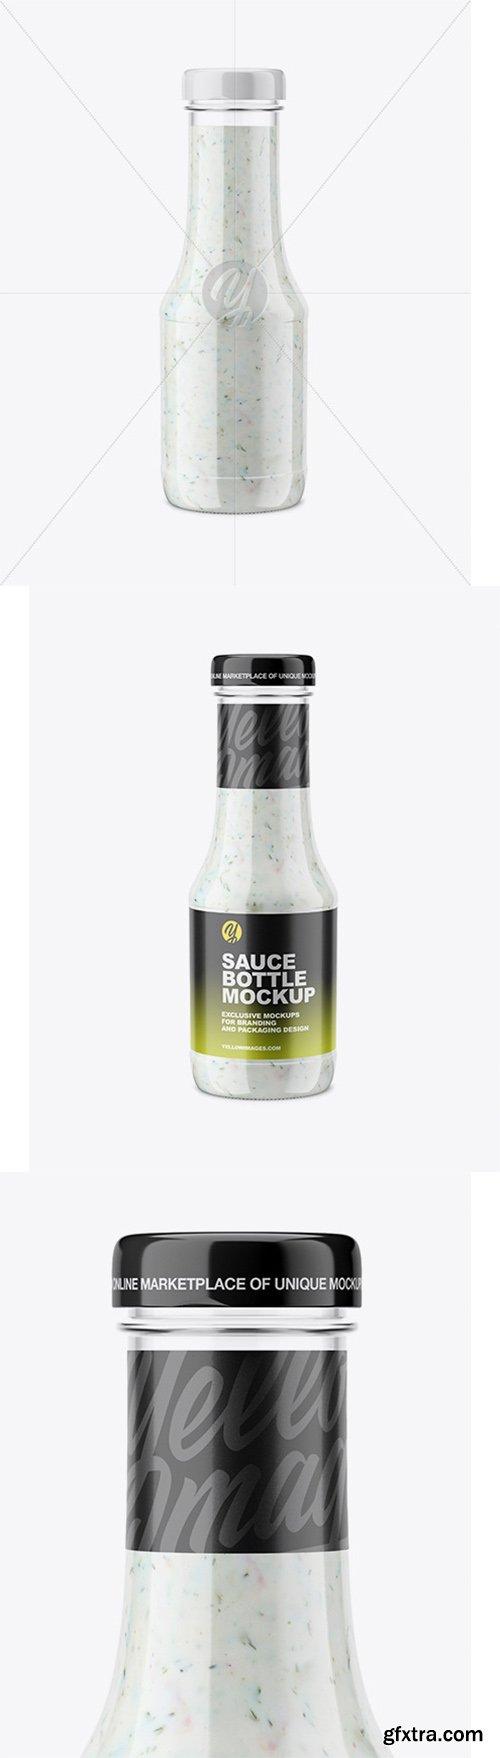 Clear Glass Sauce Bottle Mockup 66048